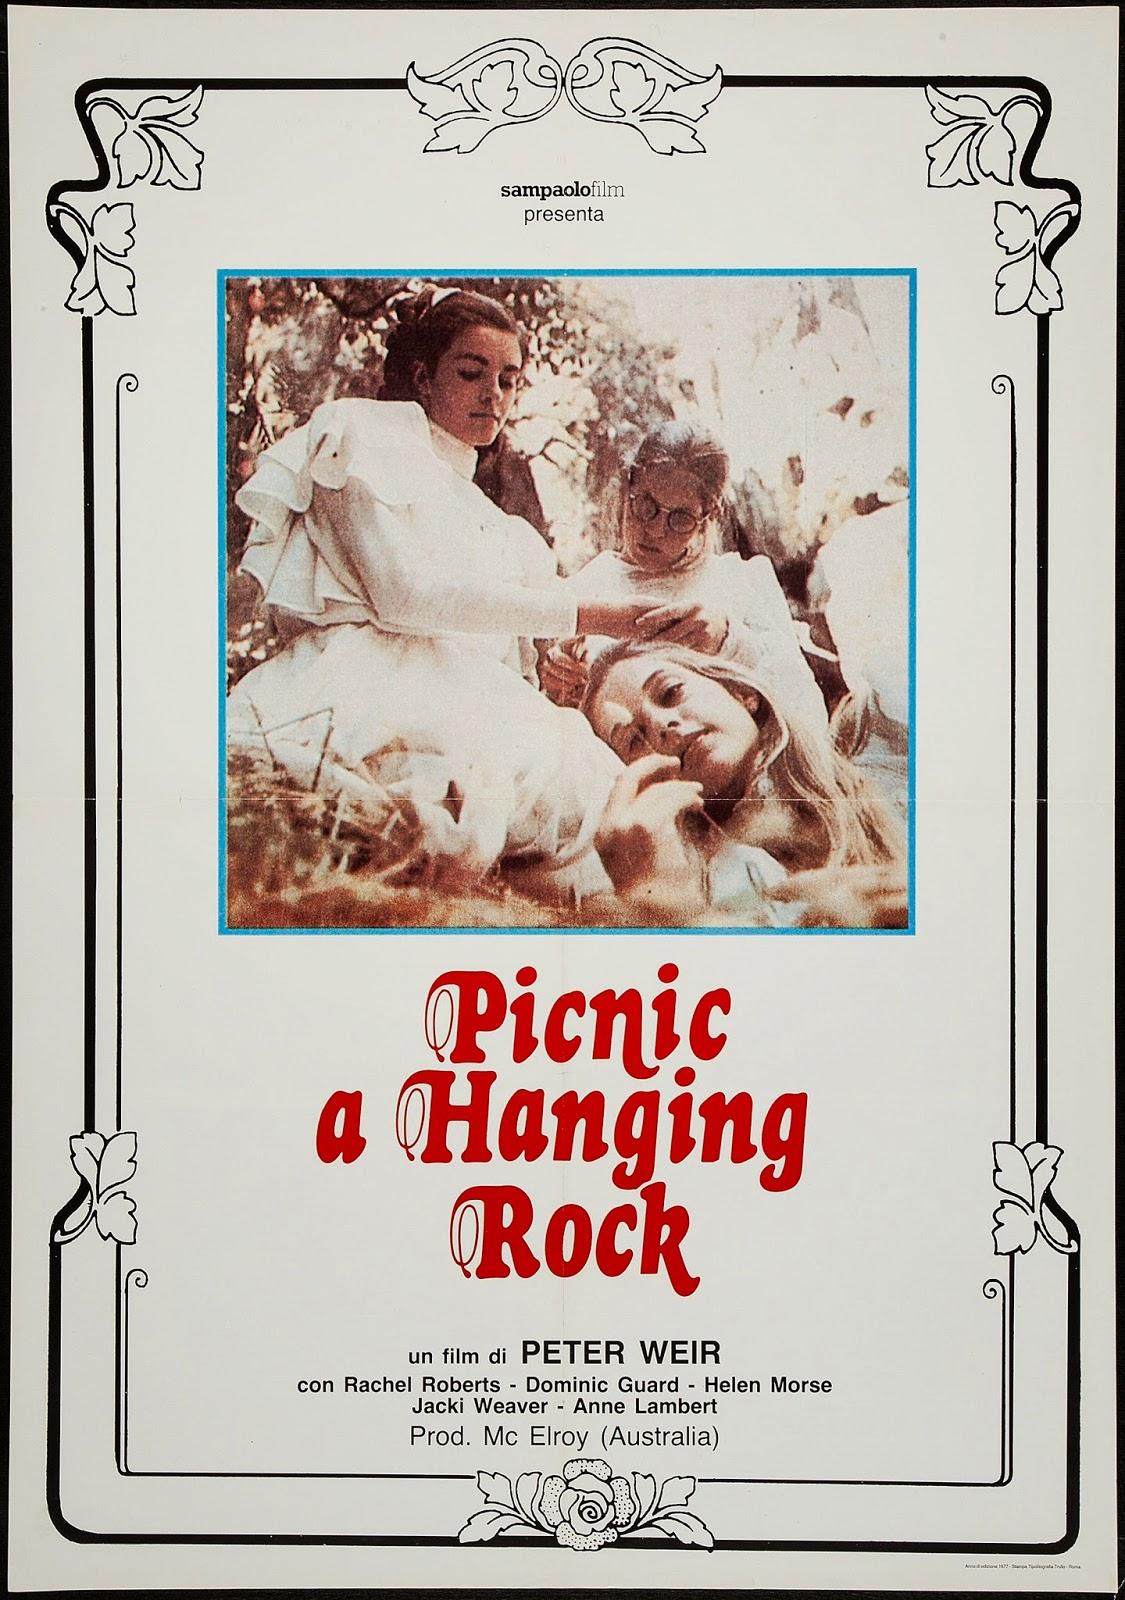 PICNIC A HANGING ROCK - Italian Poster.jpeg